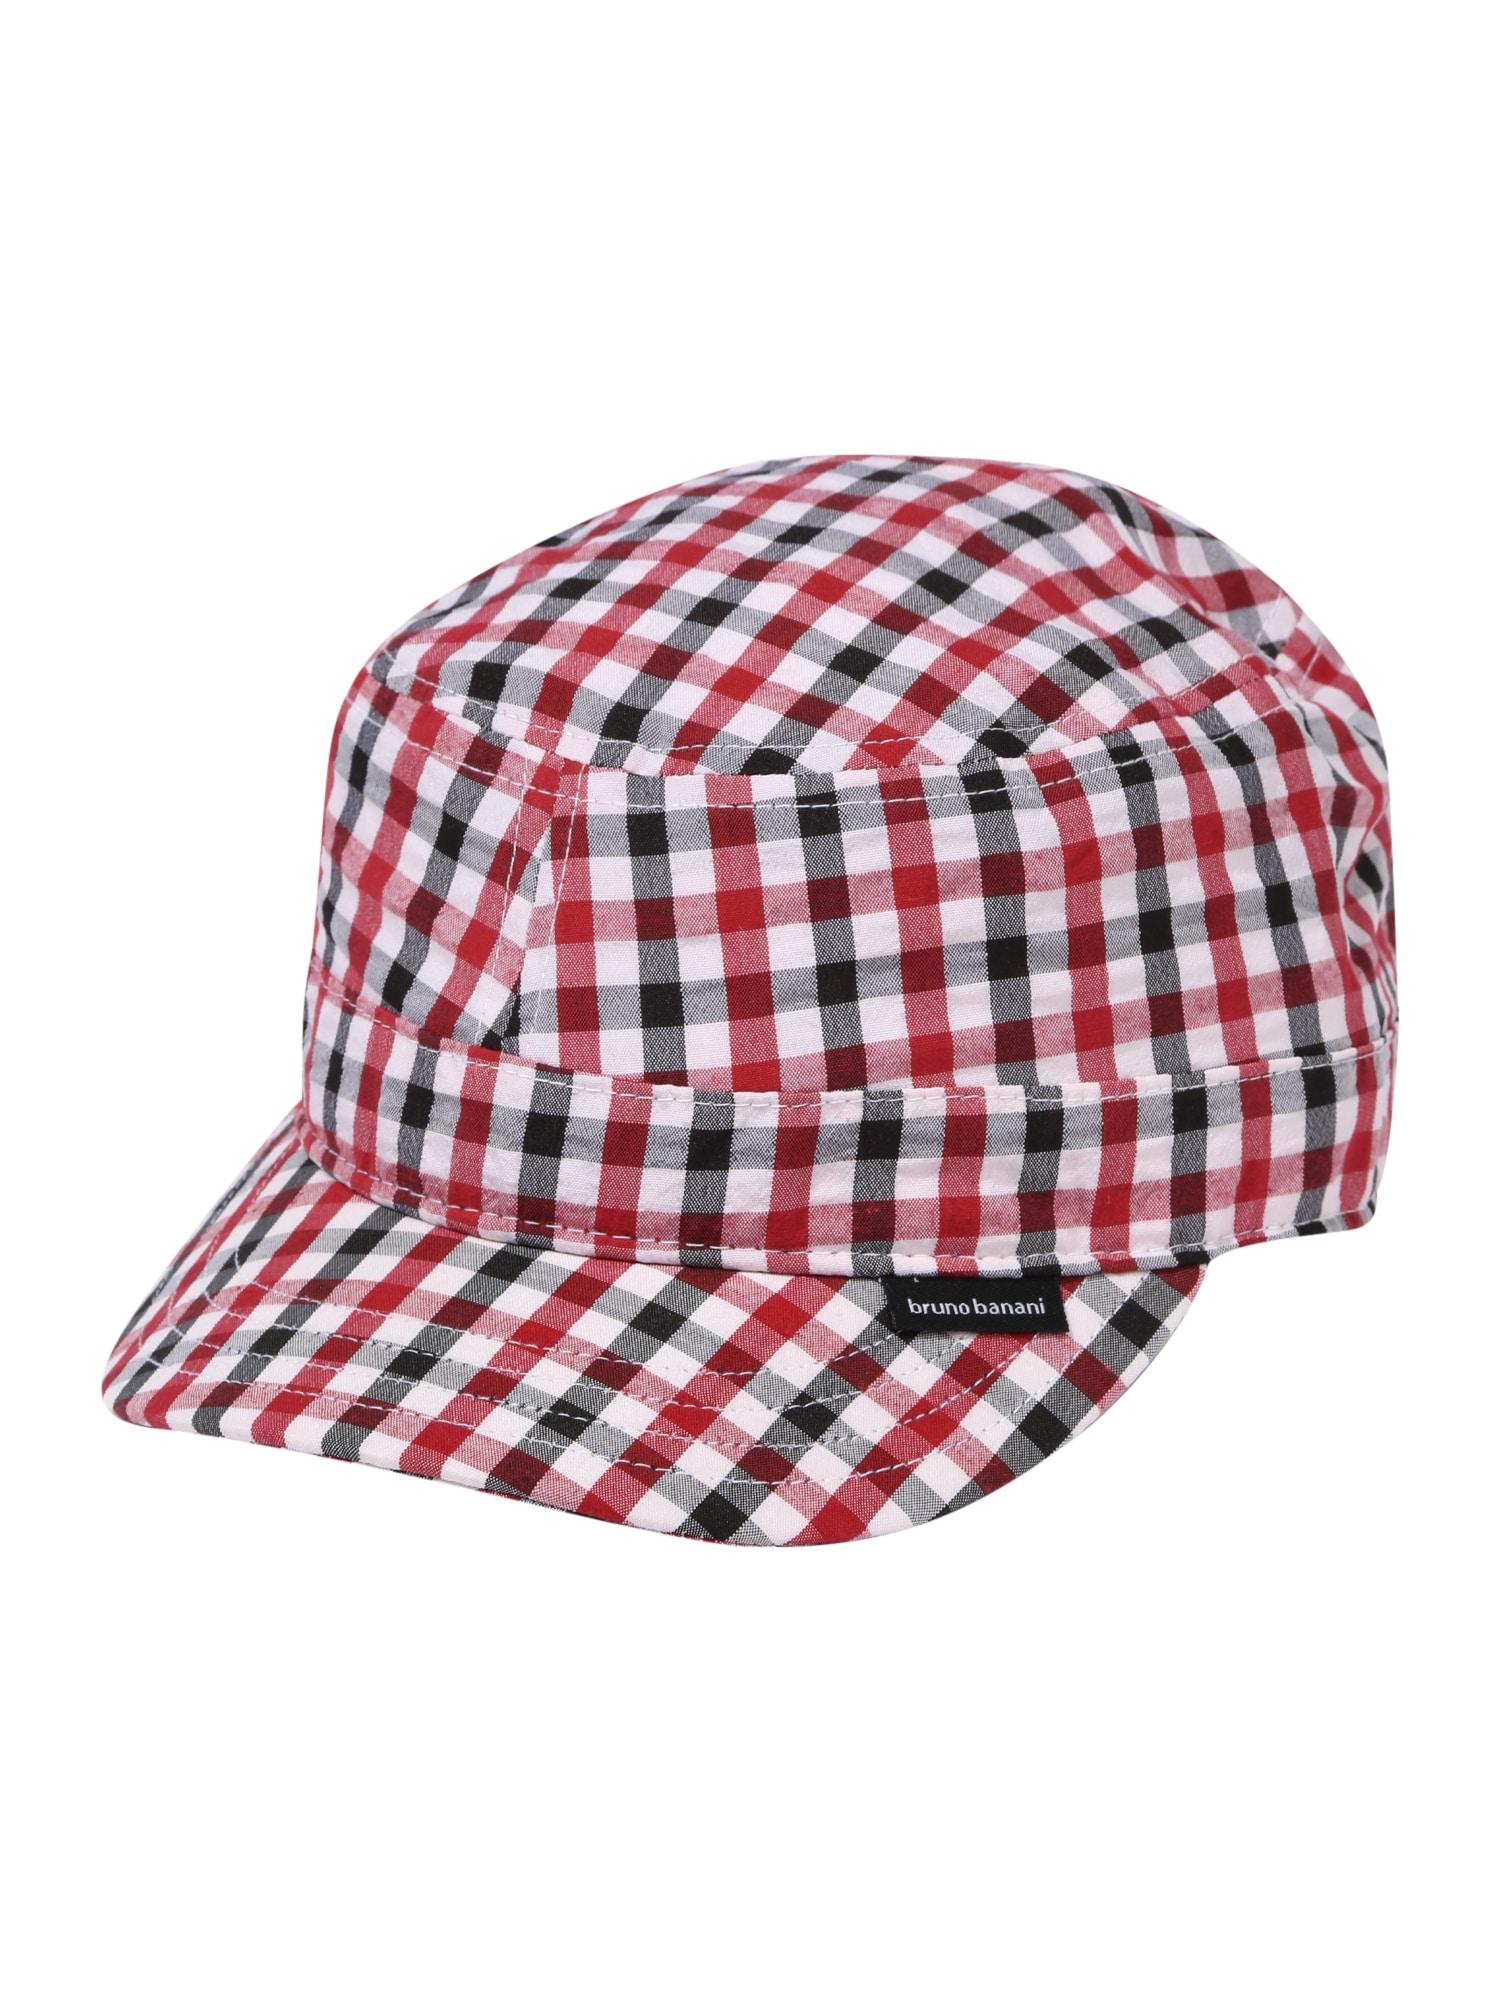 BRUNO BANANI Kepurė balta / raudona / juoda